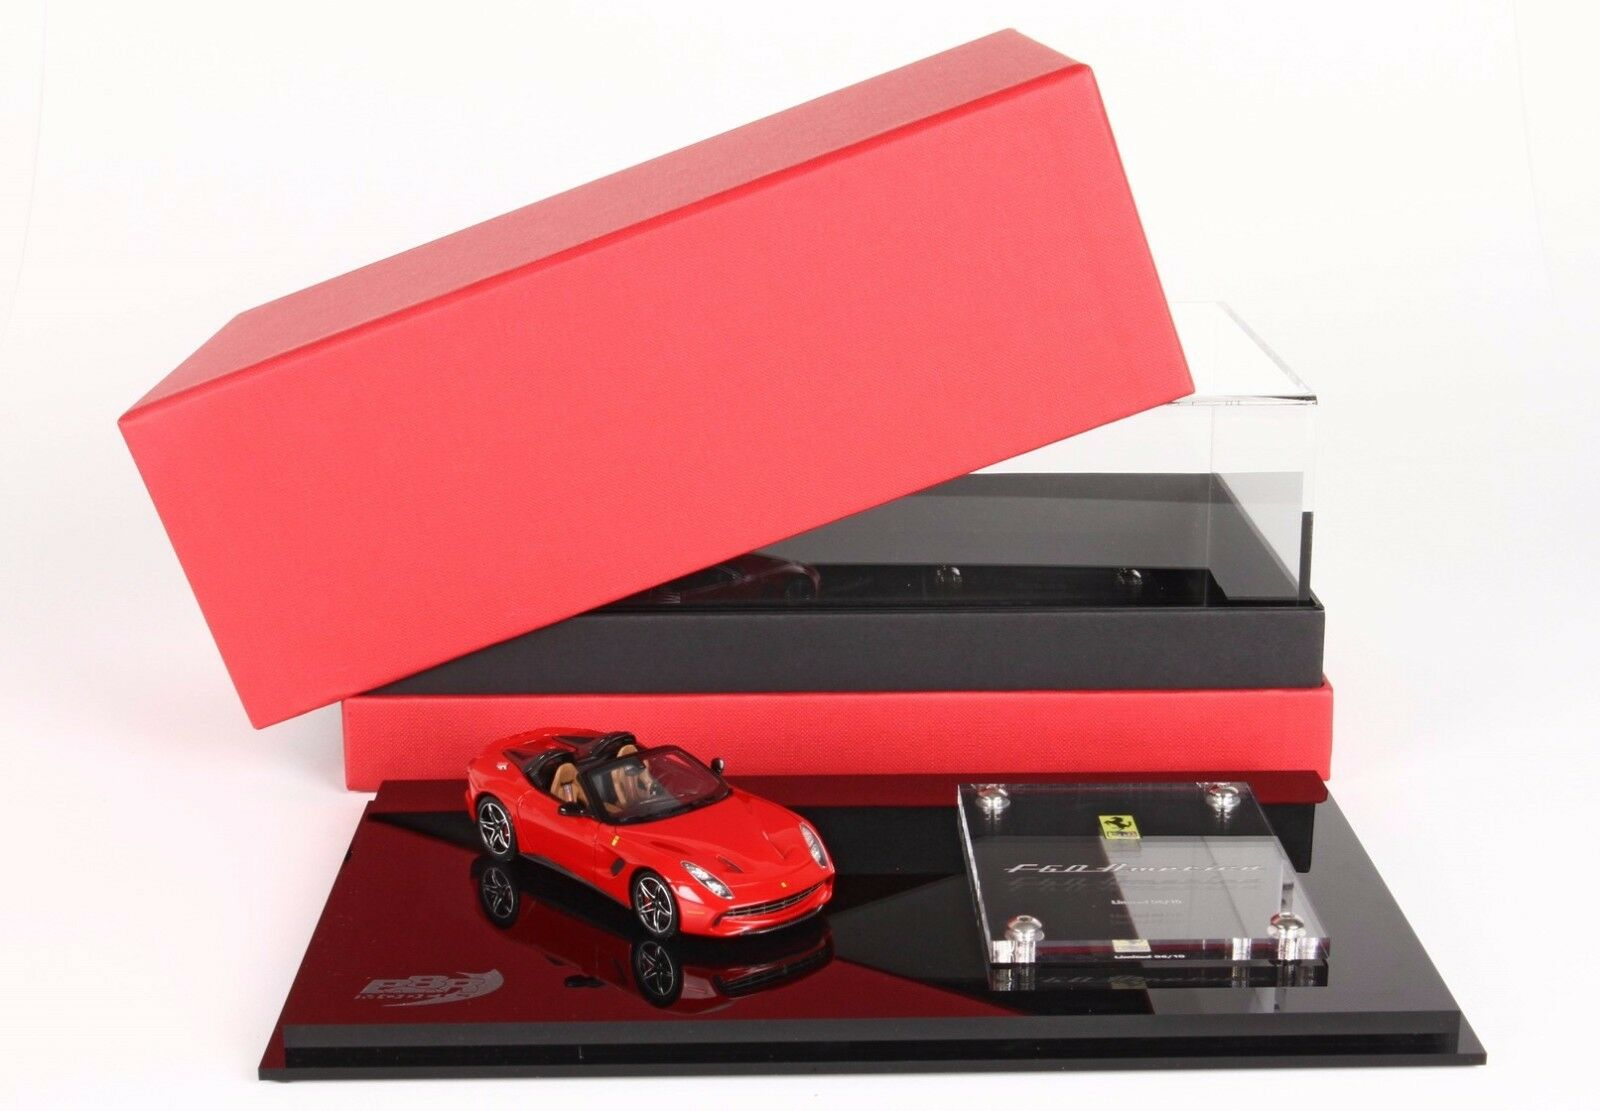 Ferrari F60 America rouge Corsa 1 43 lim.ed. 10 pcs BBRC182FCO  BBR